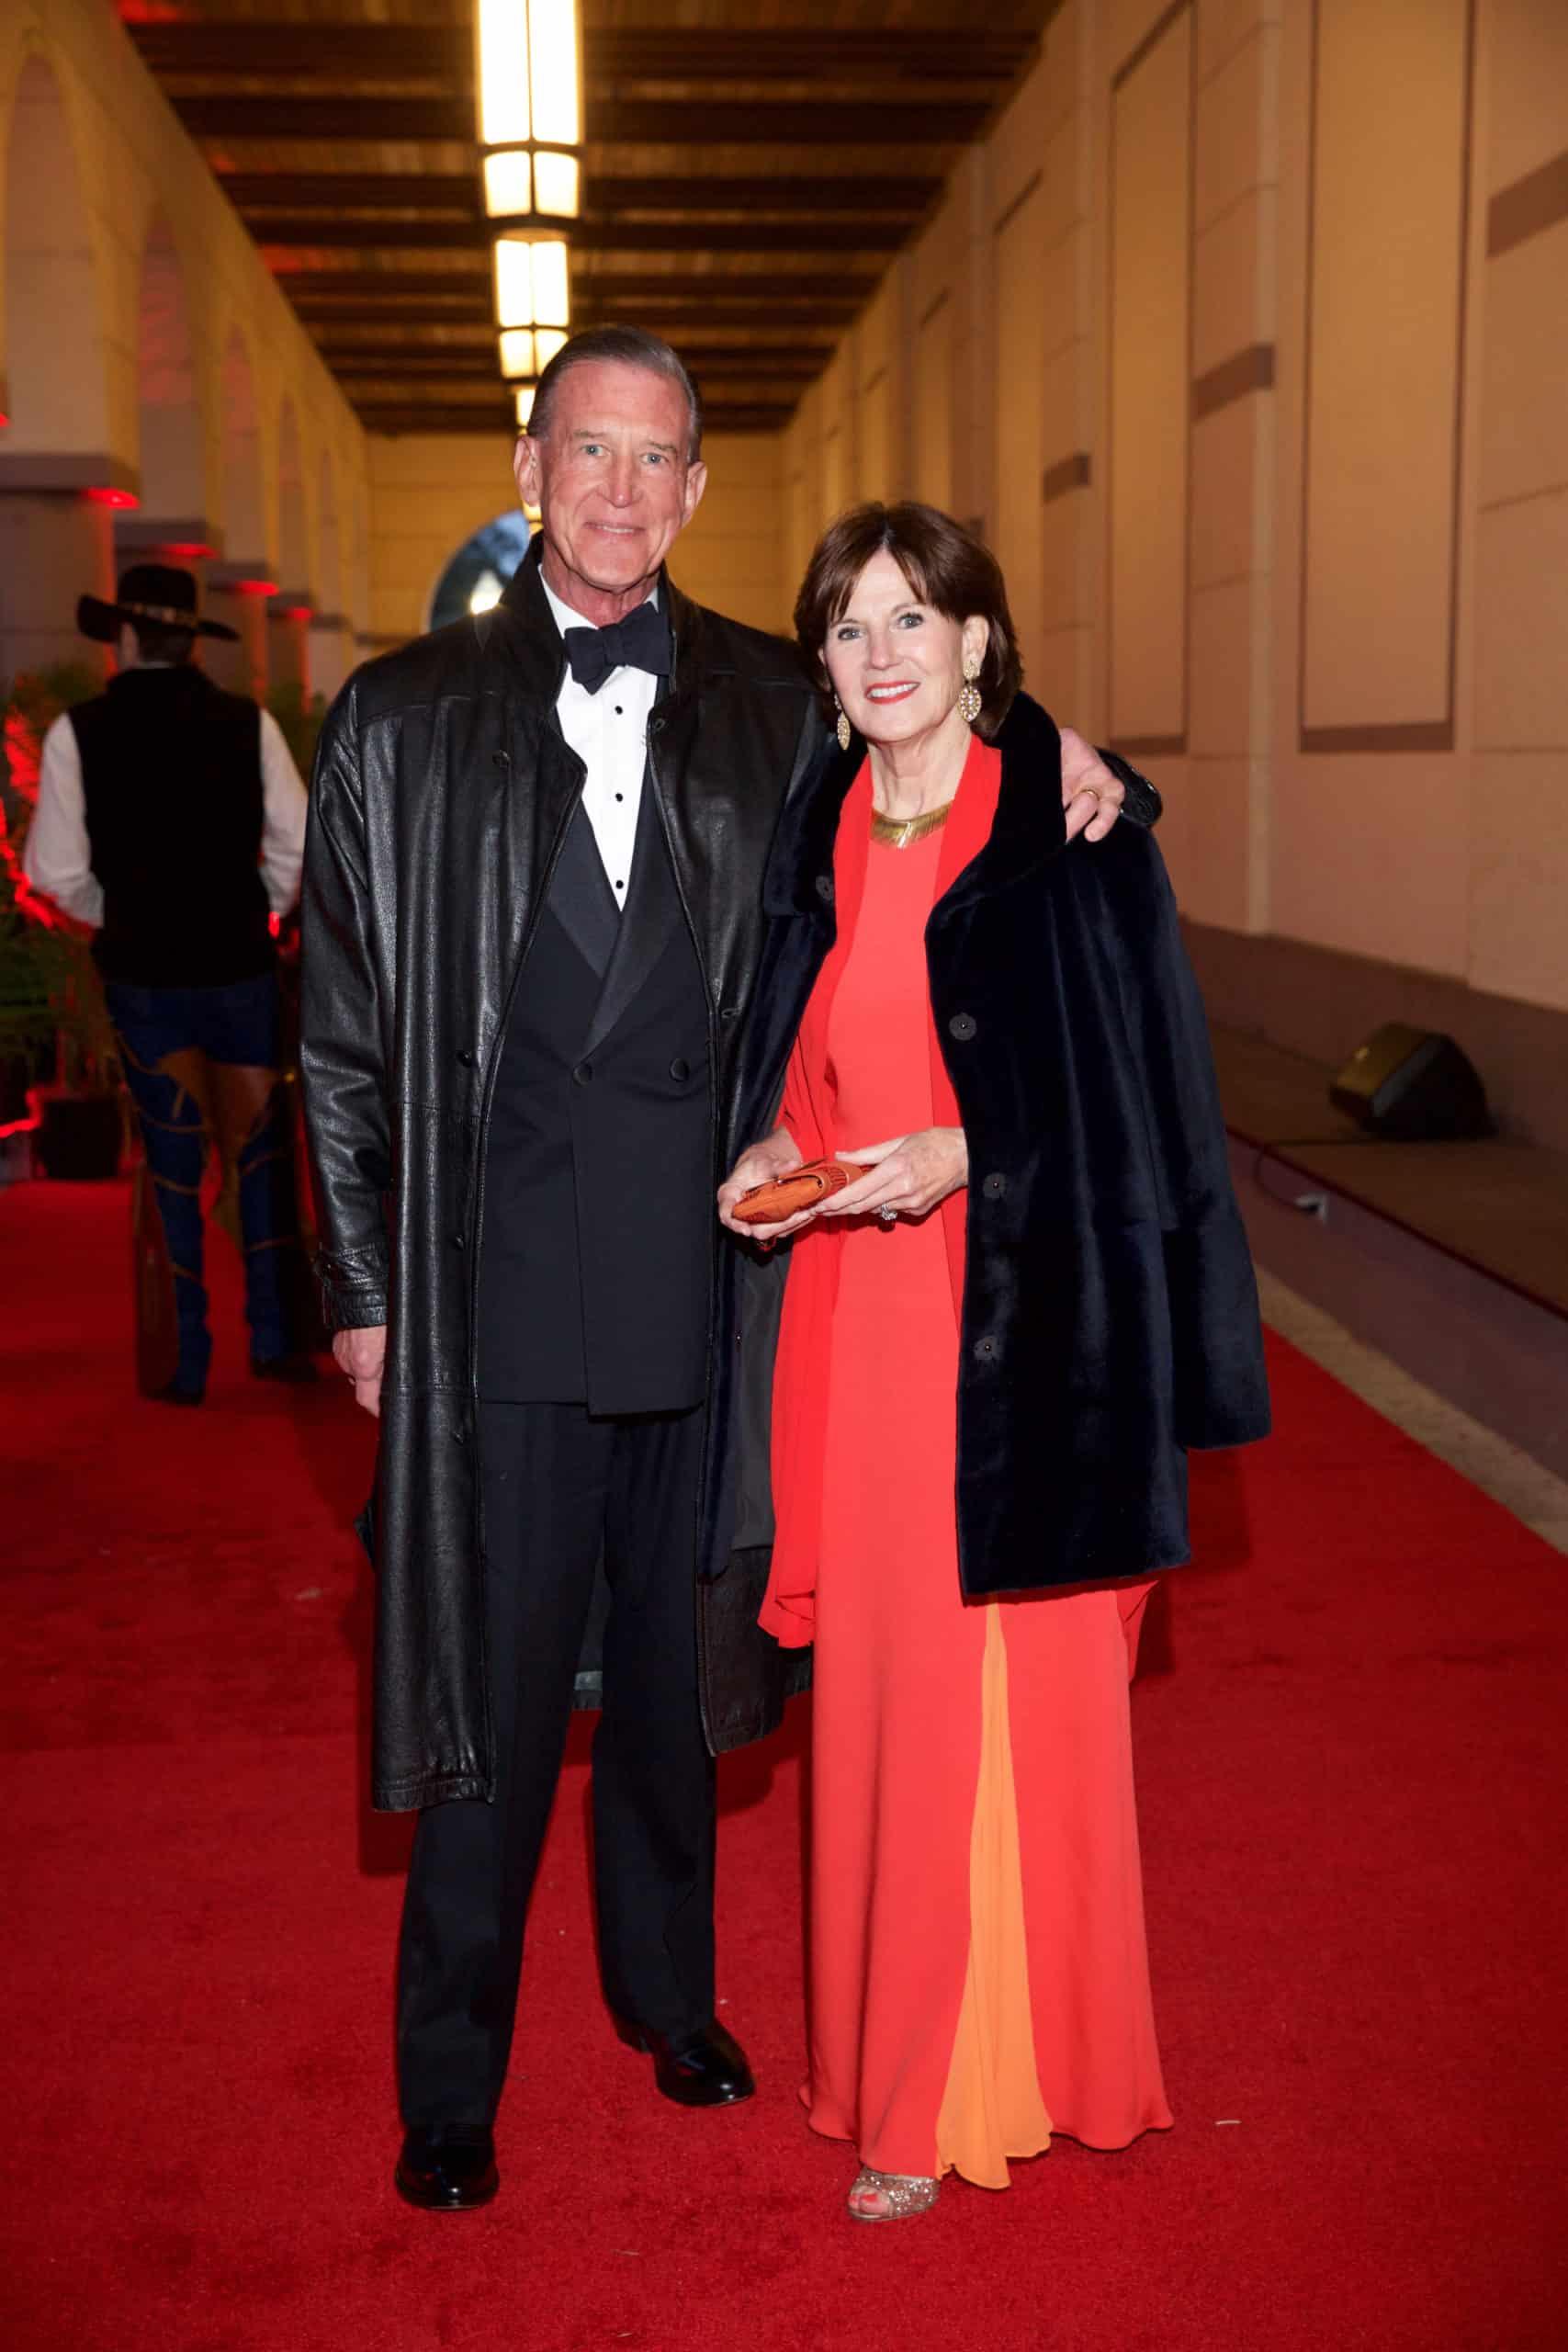 Charles and Judy Tate